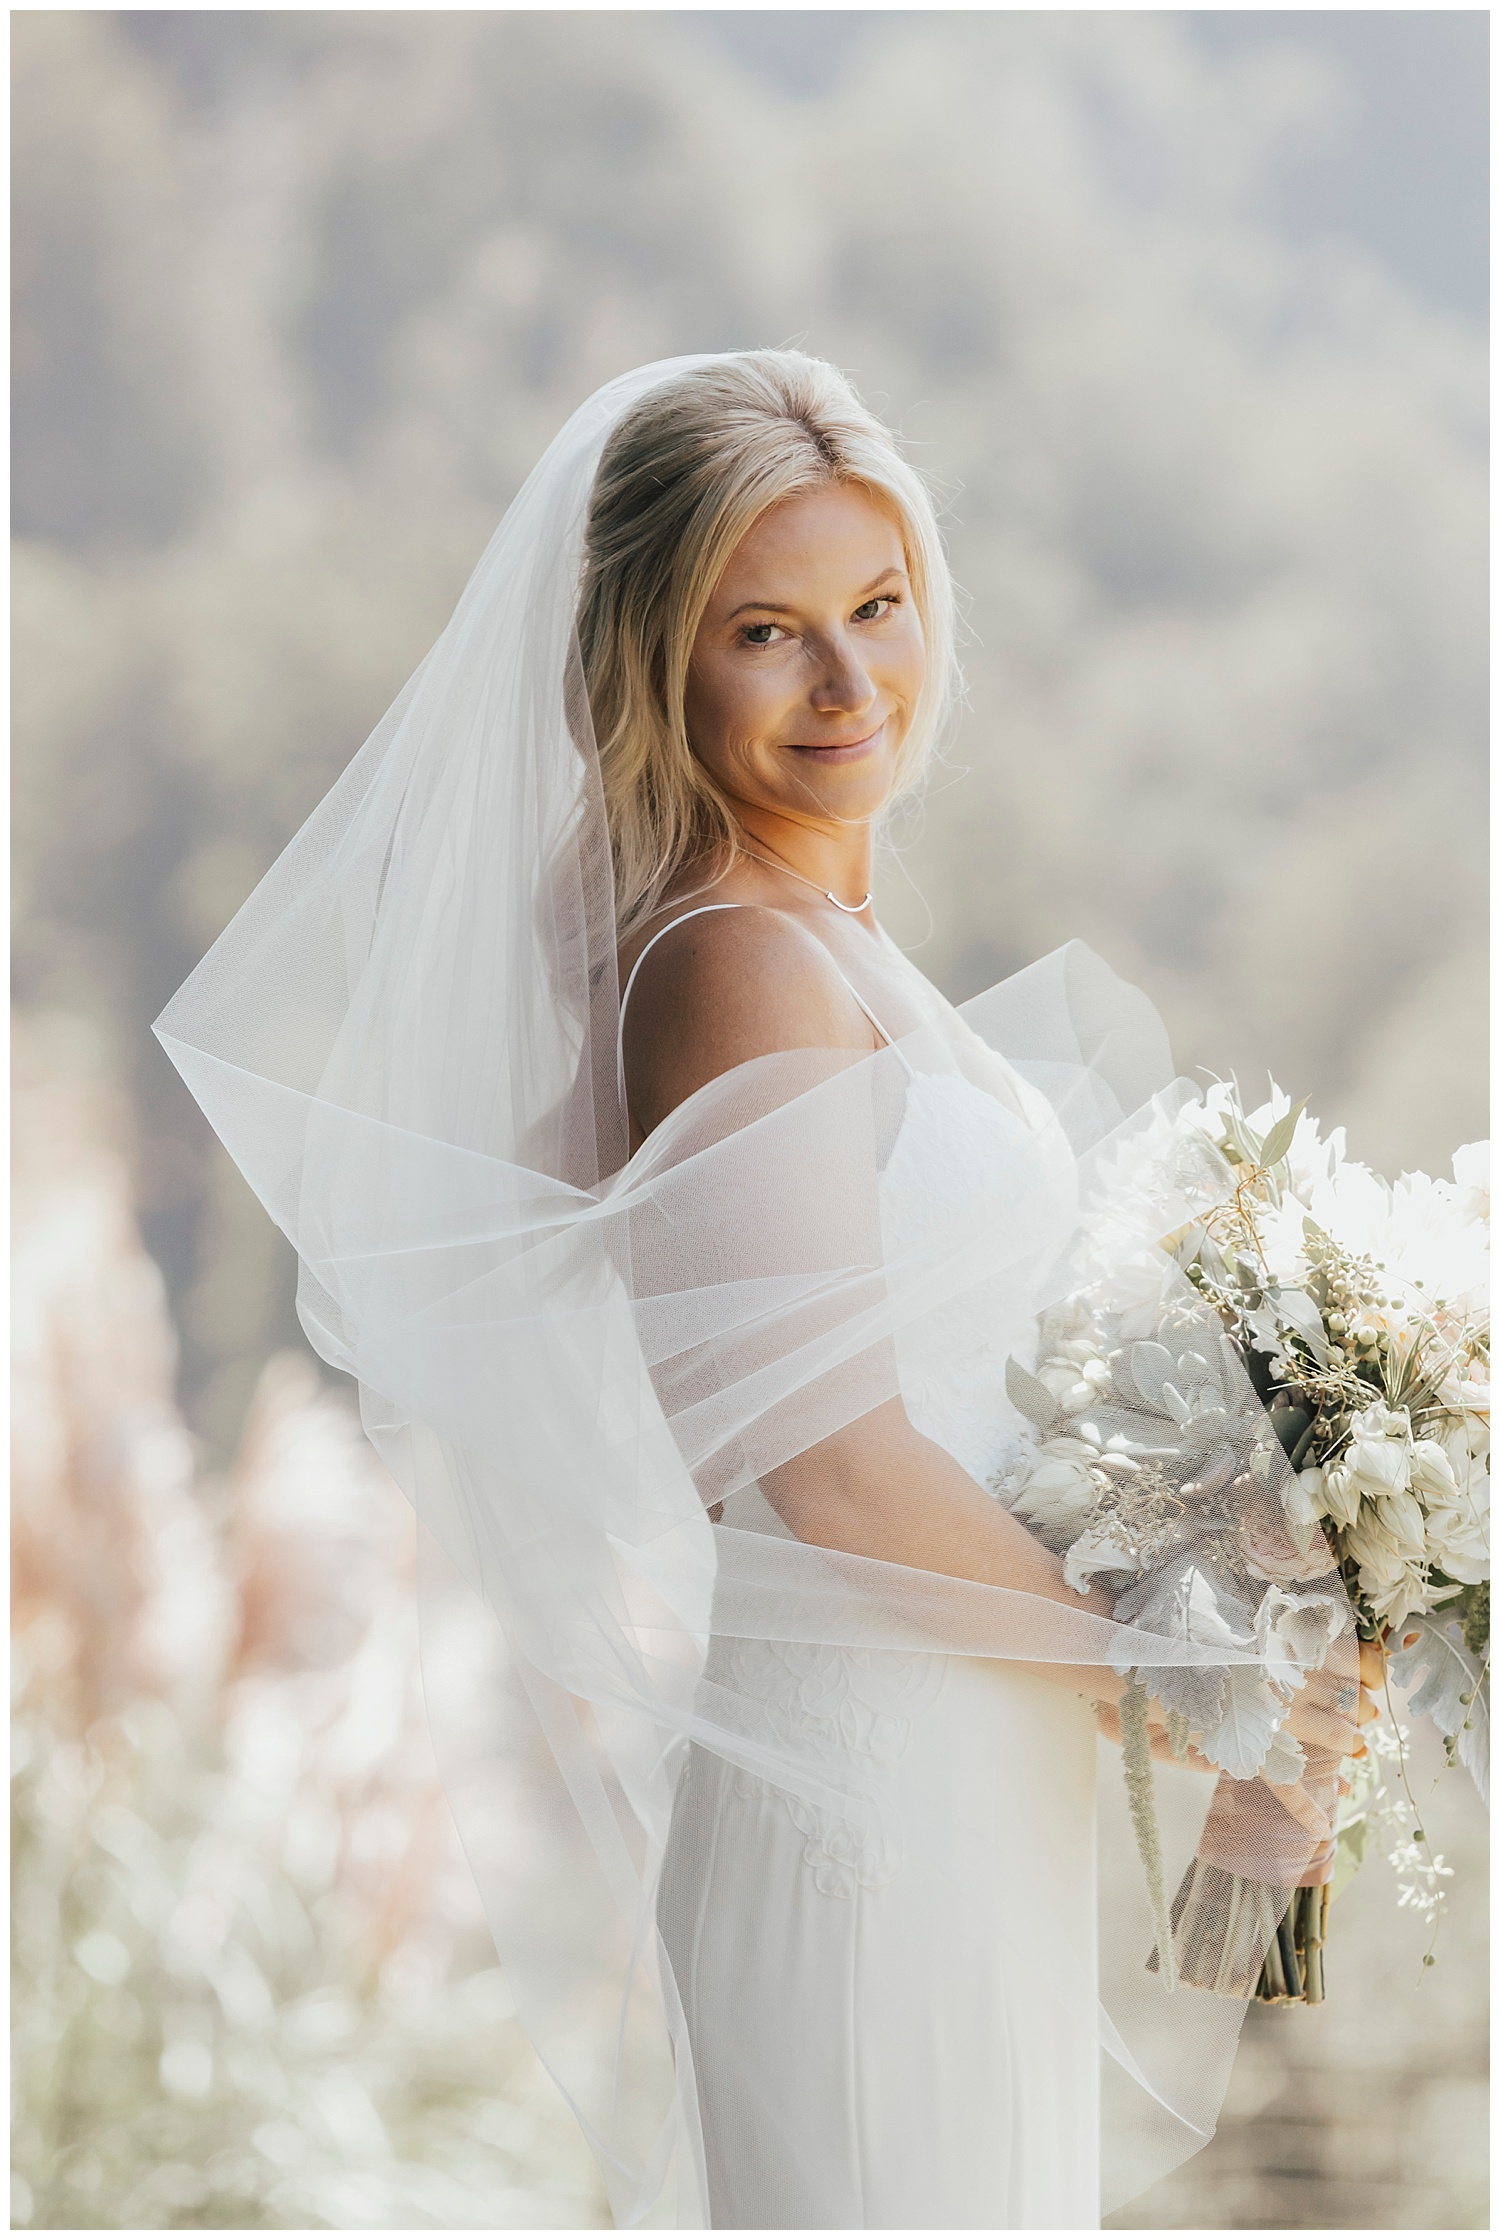 bride-portrait-big-sur-wedding-carol-oliva-photography.jpg